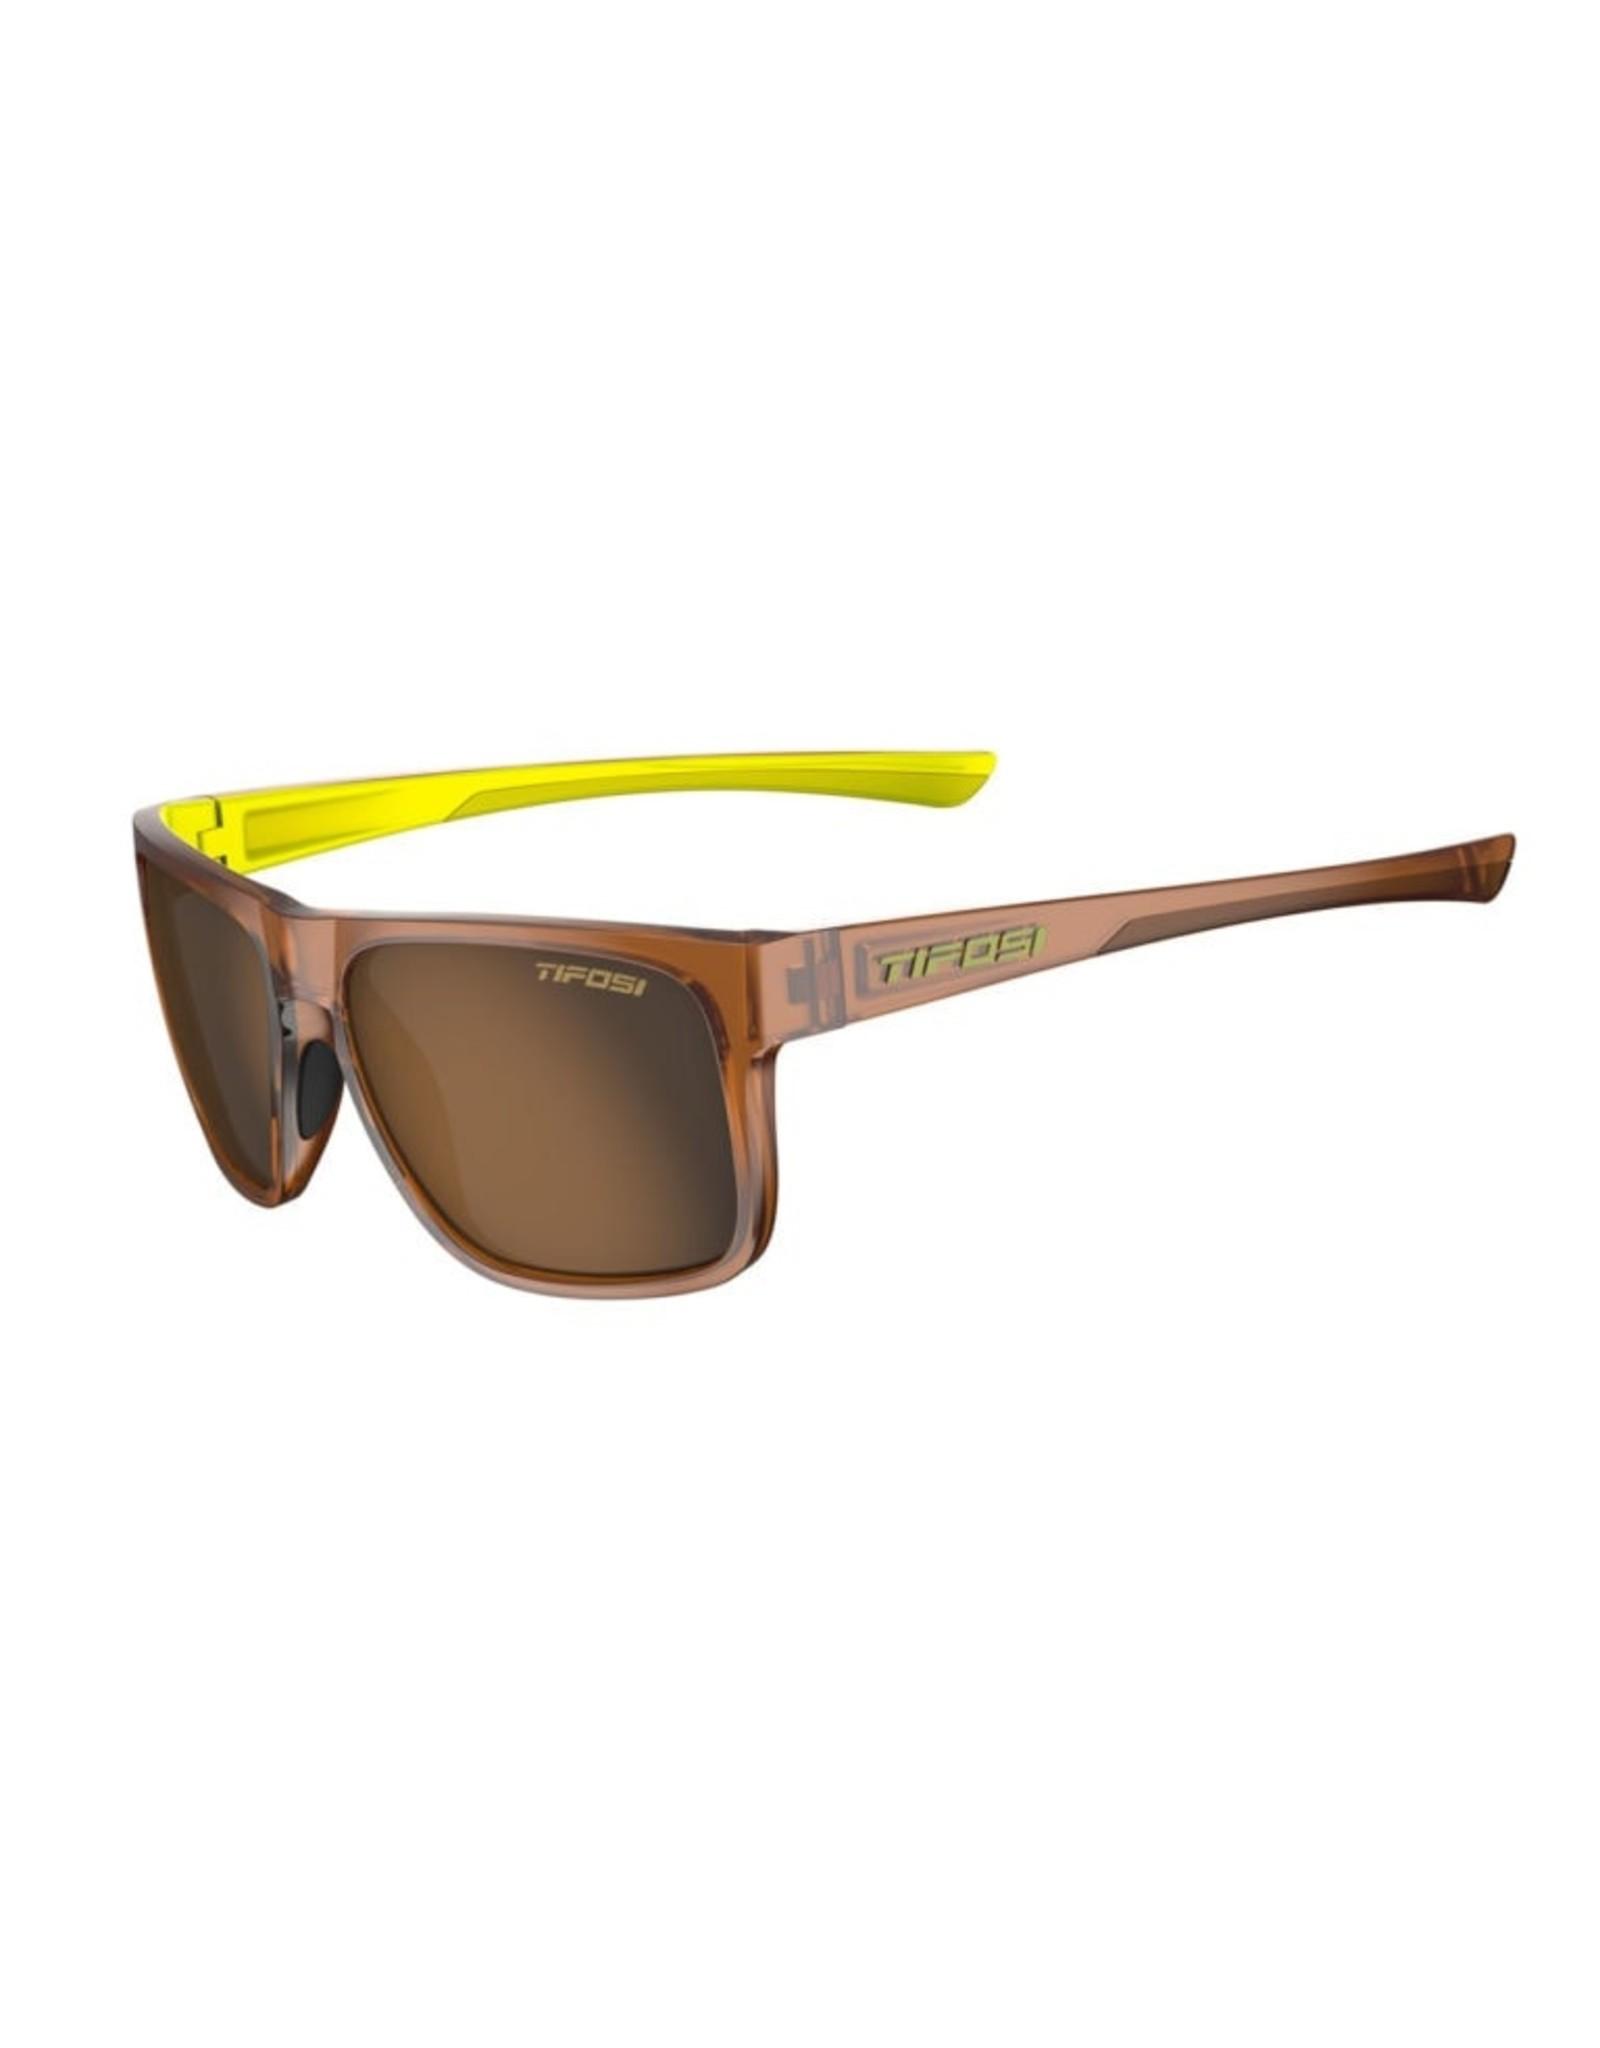 Tifosi Optics Swick, Caramel/Neon Polarized Sunglasses - Brown Polarized